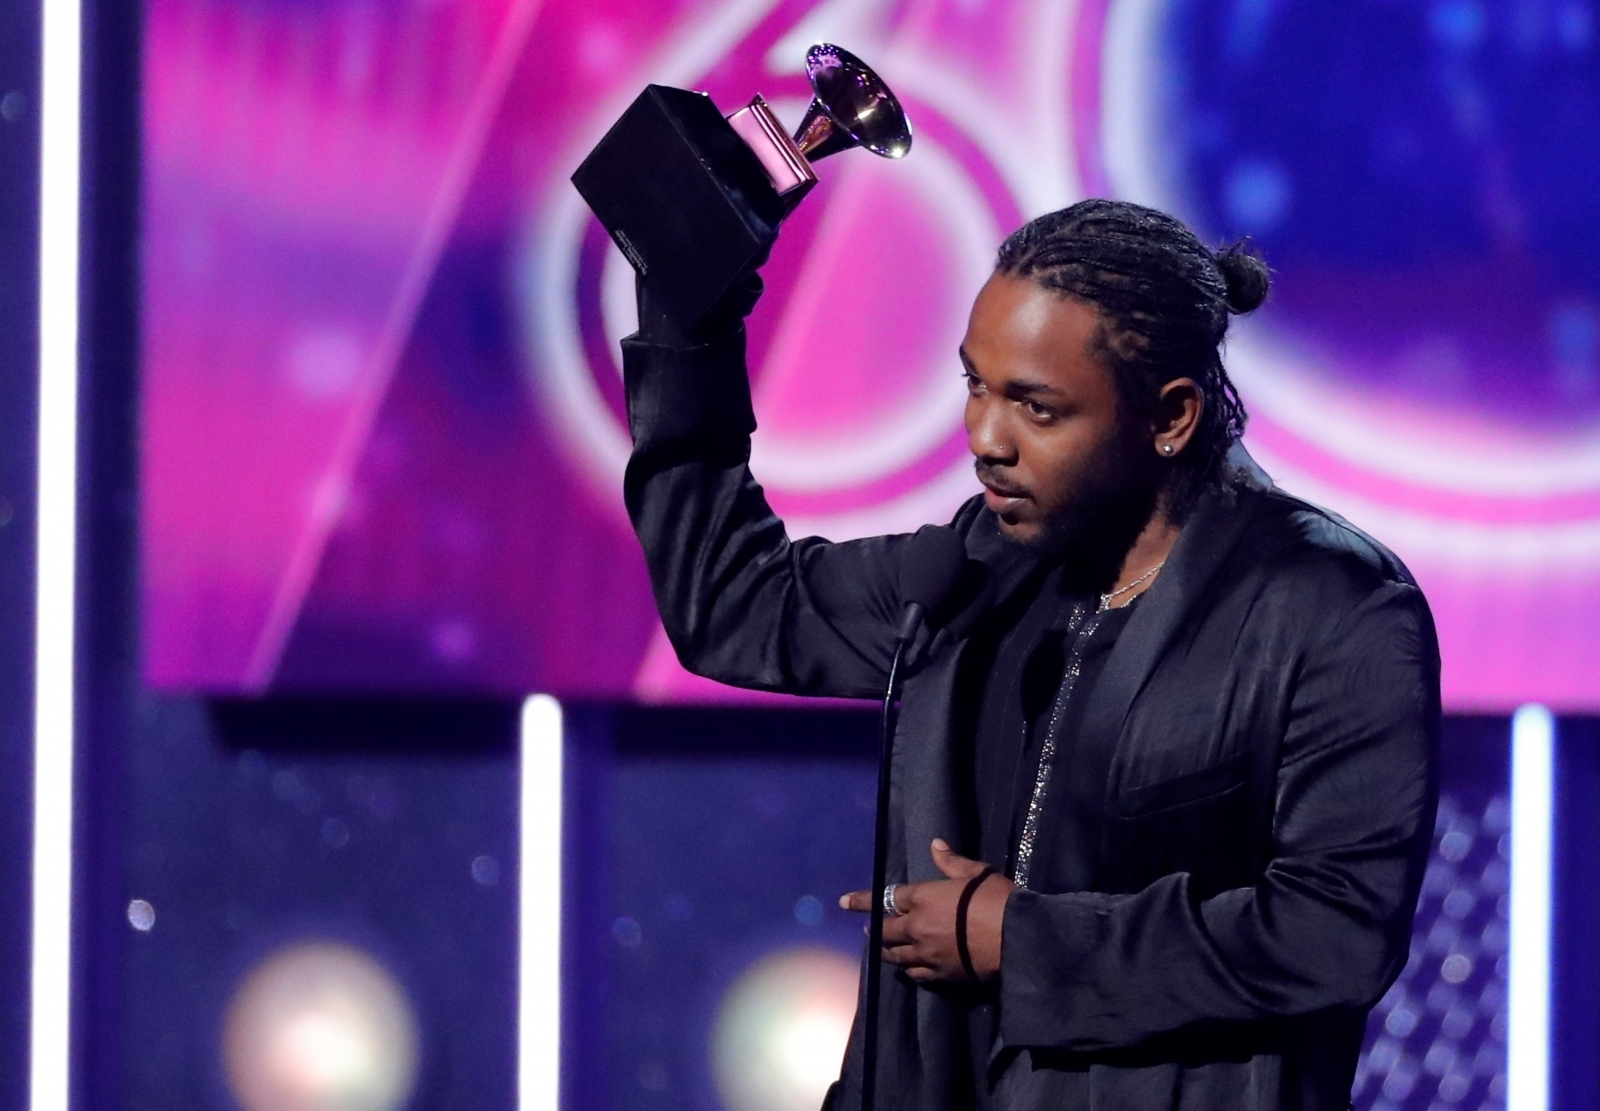 2018 Grammys: Grammy Awards 2018